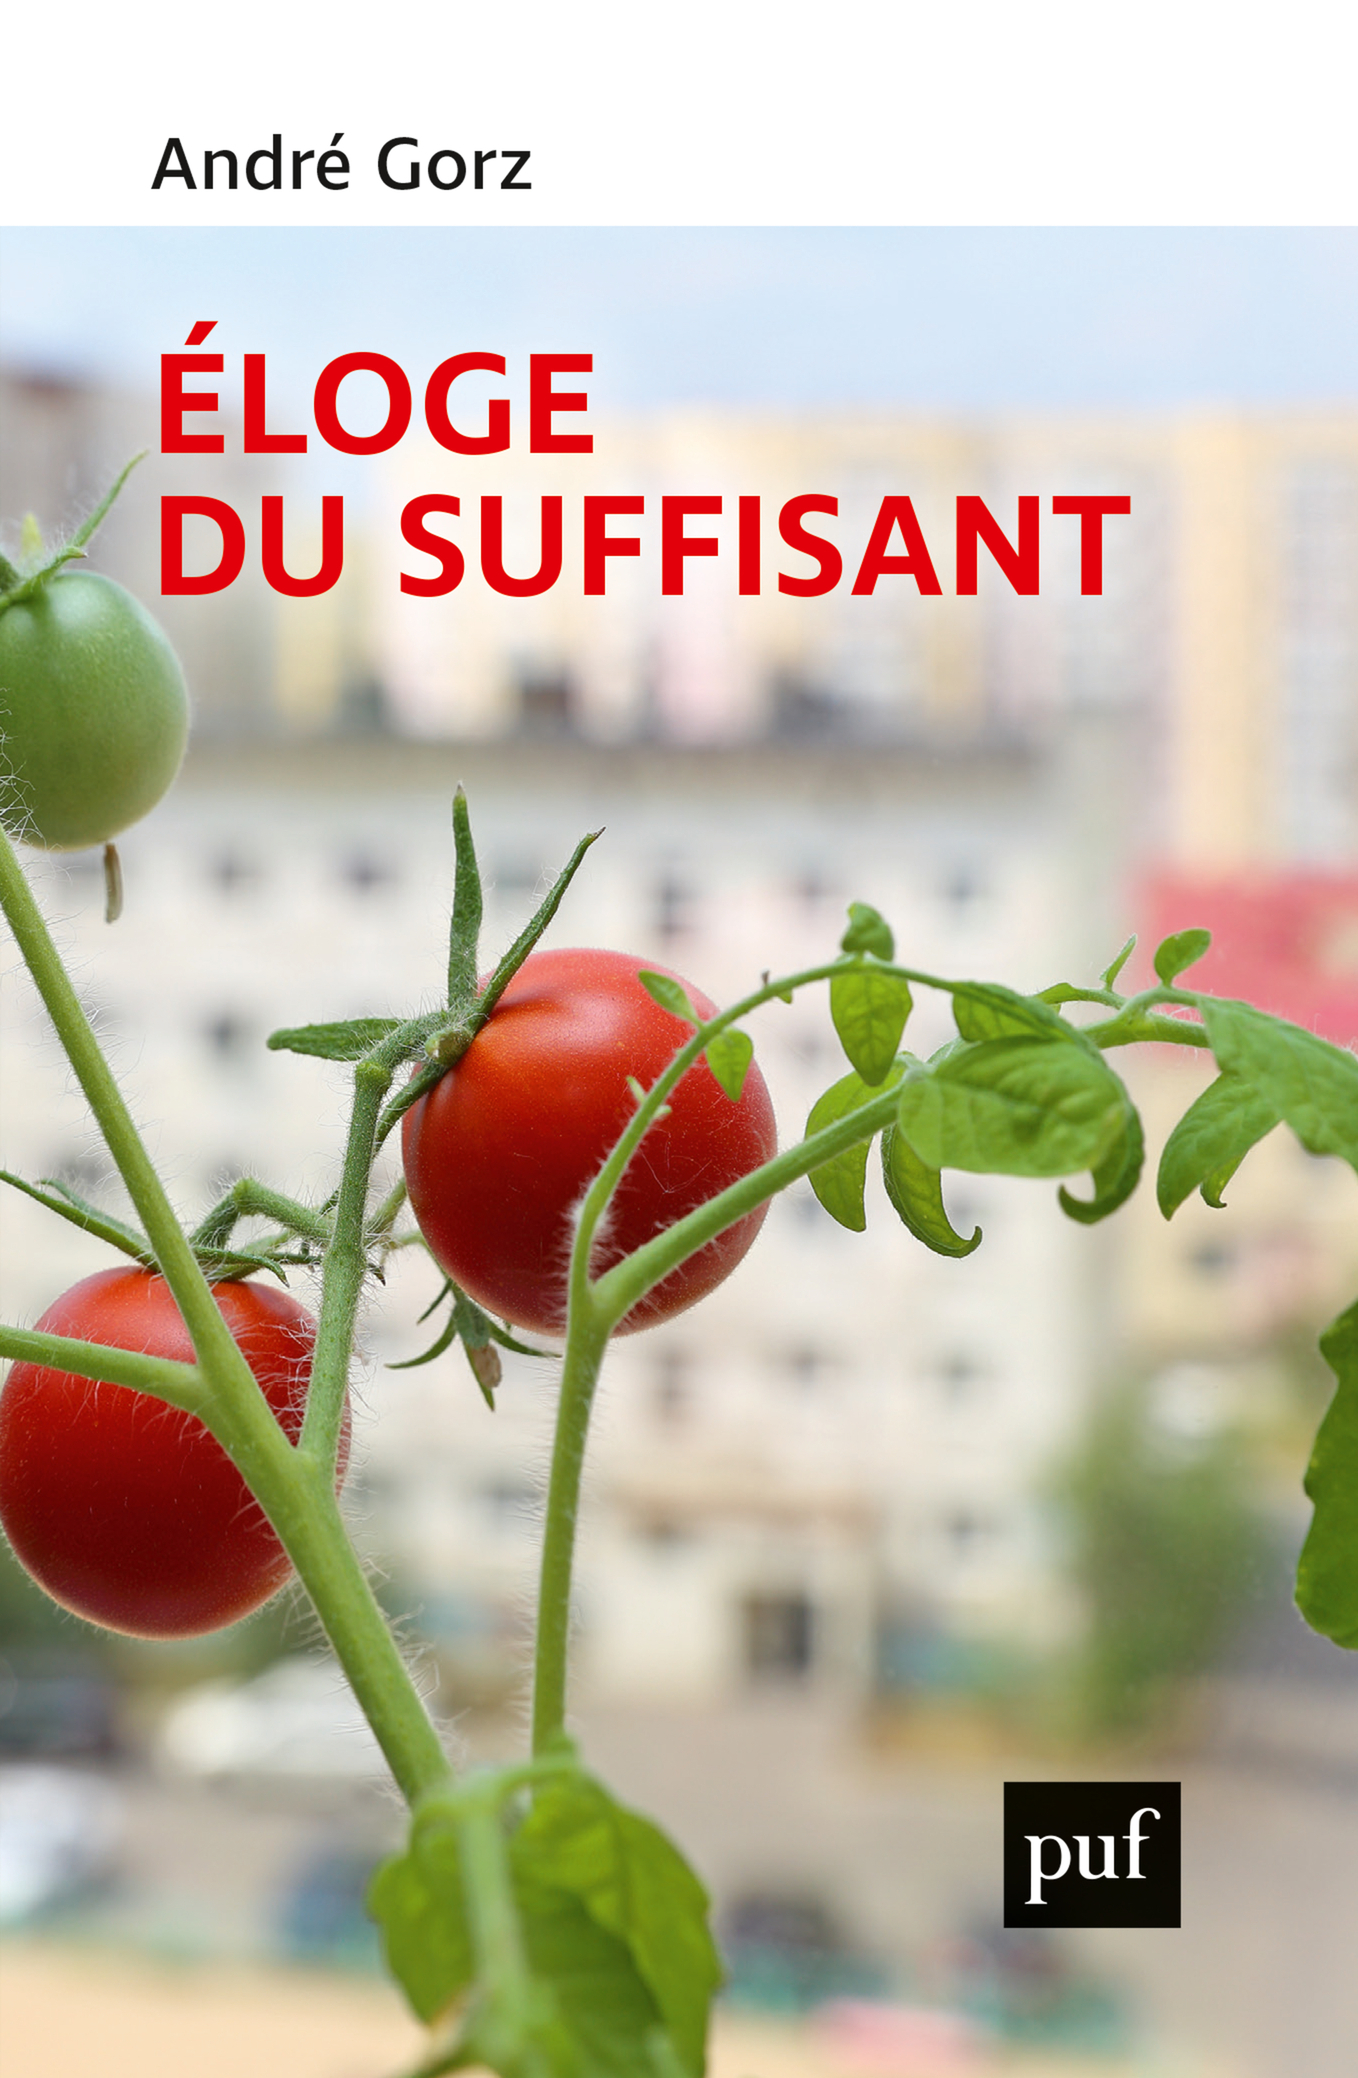 ELOGE DU SUFFISANT